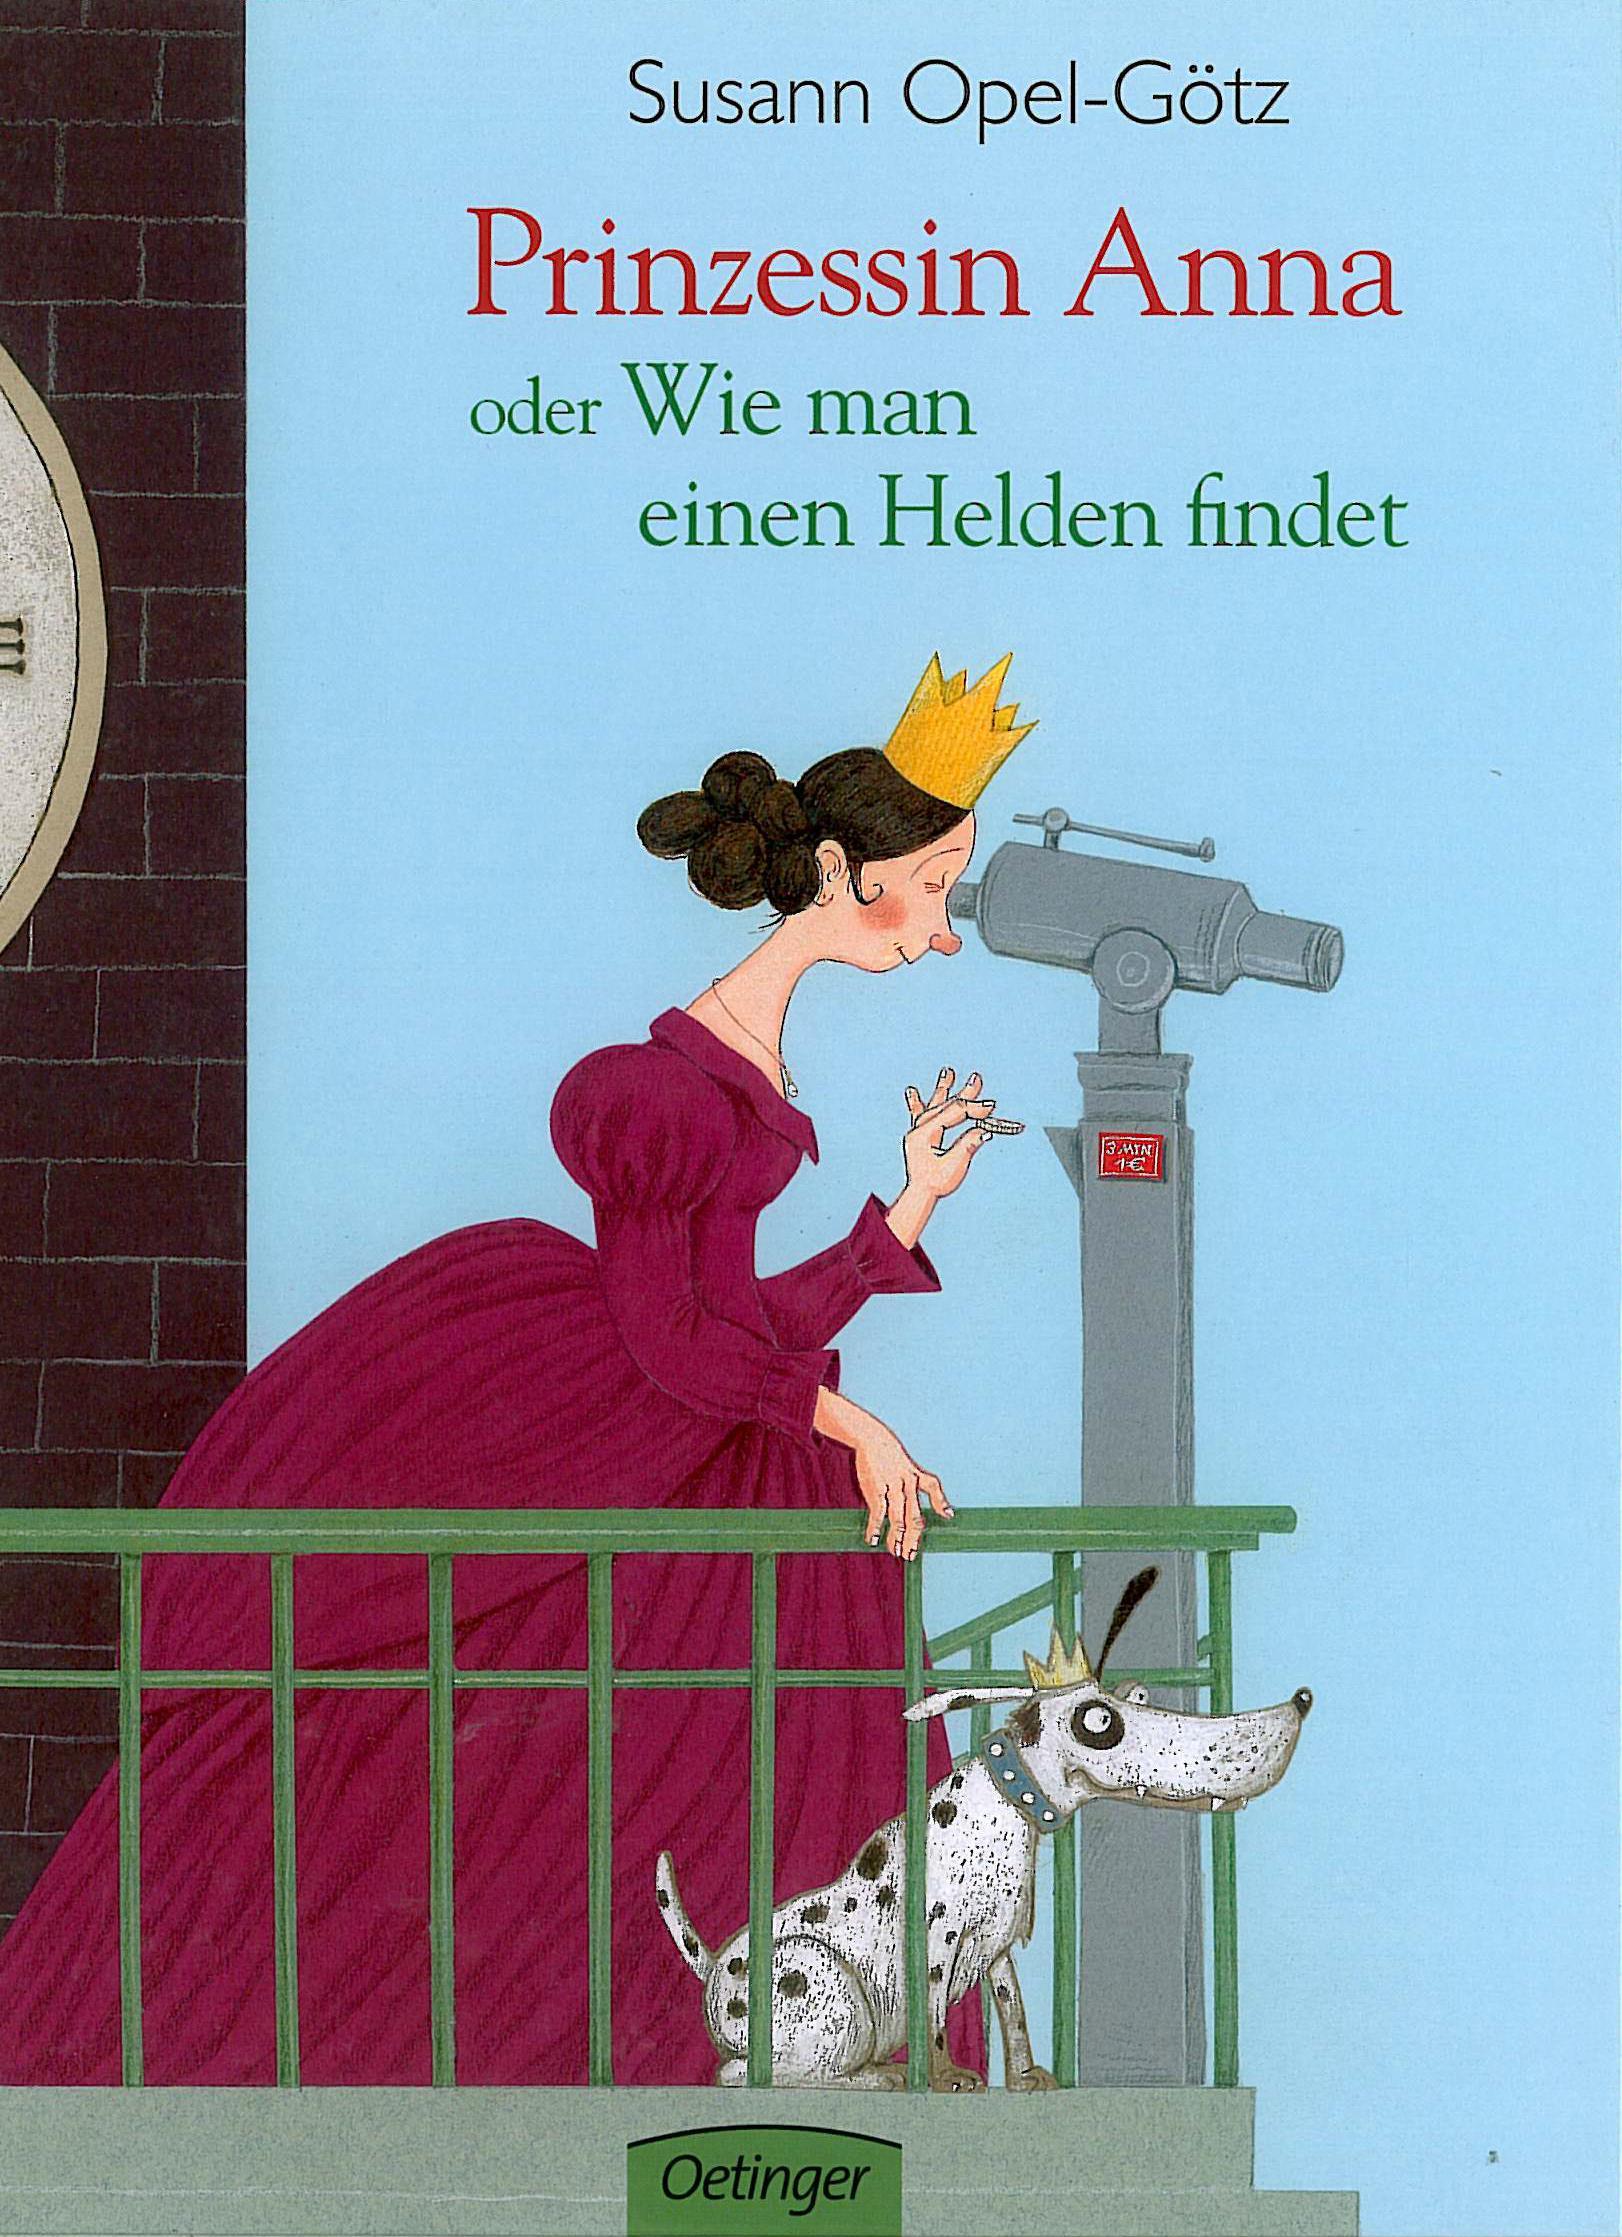 KinderundJugendmedien.de - Fachlexikon